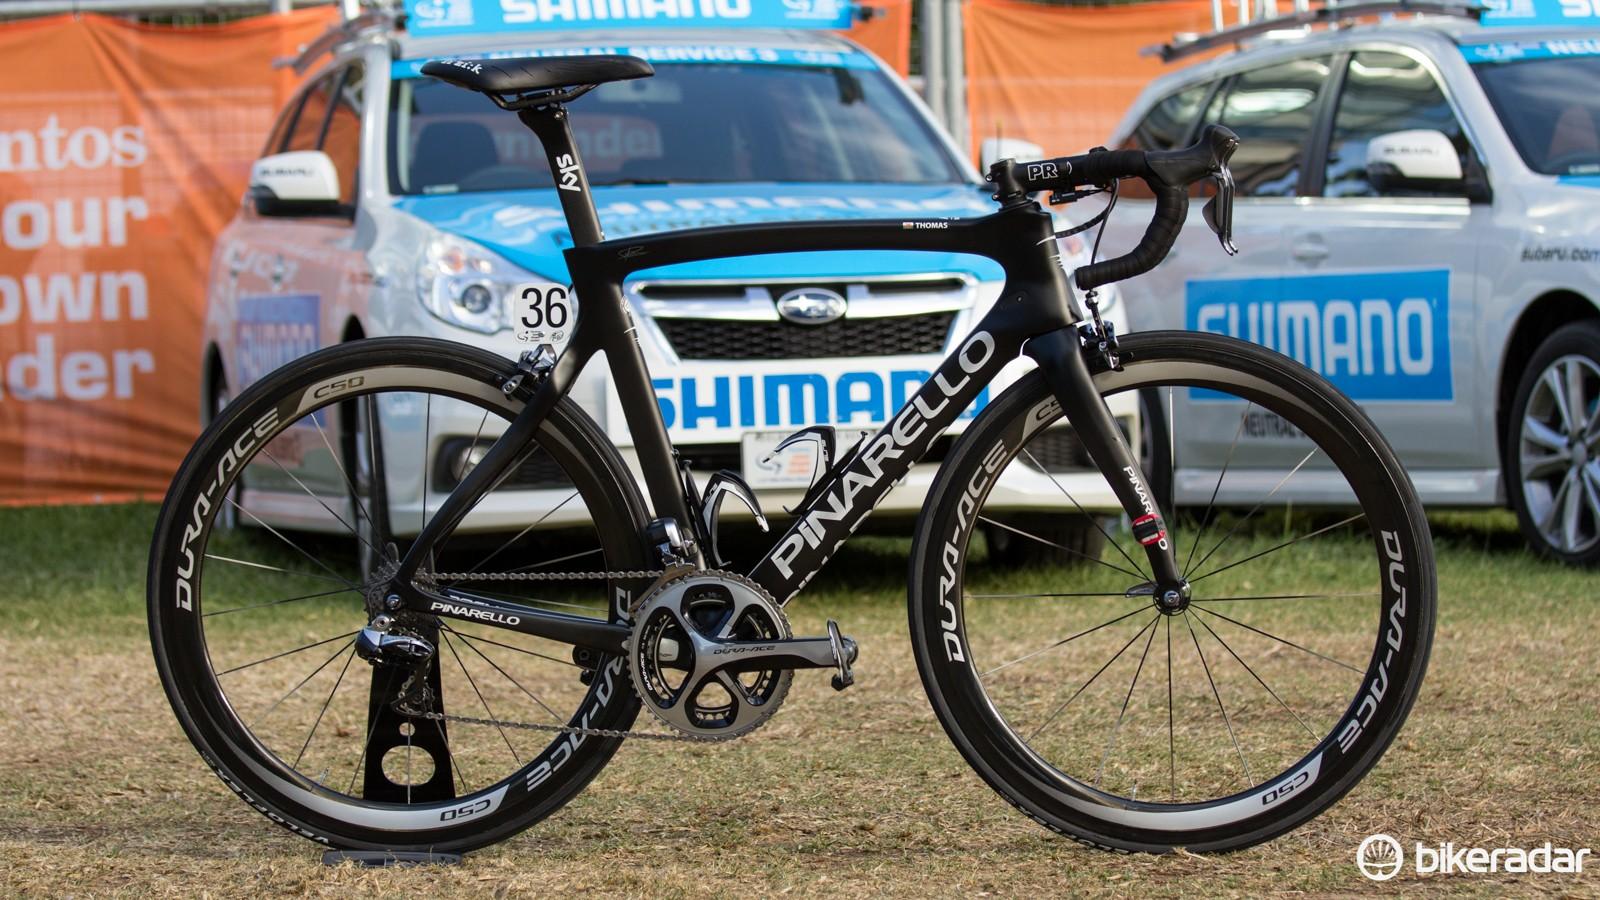 Pro bike: Geraint Thomas' Pinarello Dogma F8